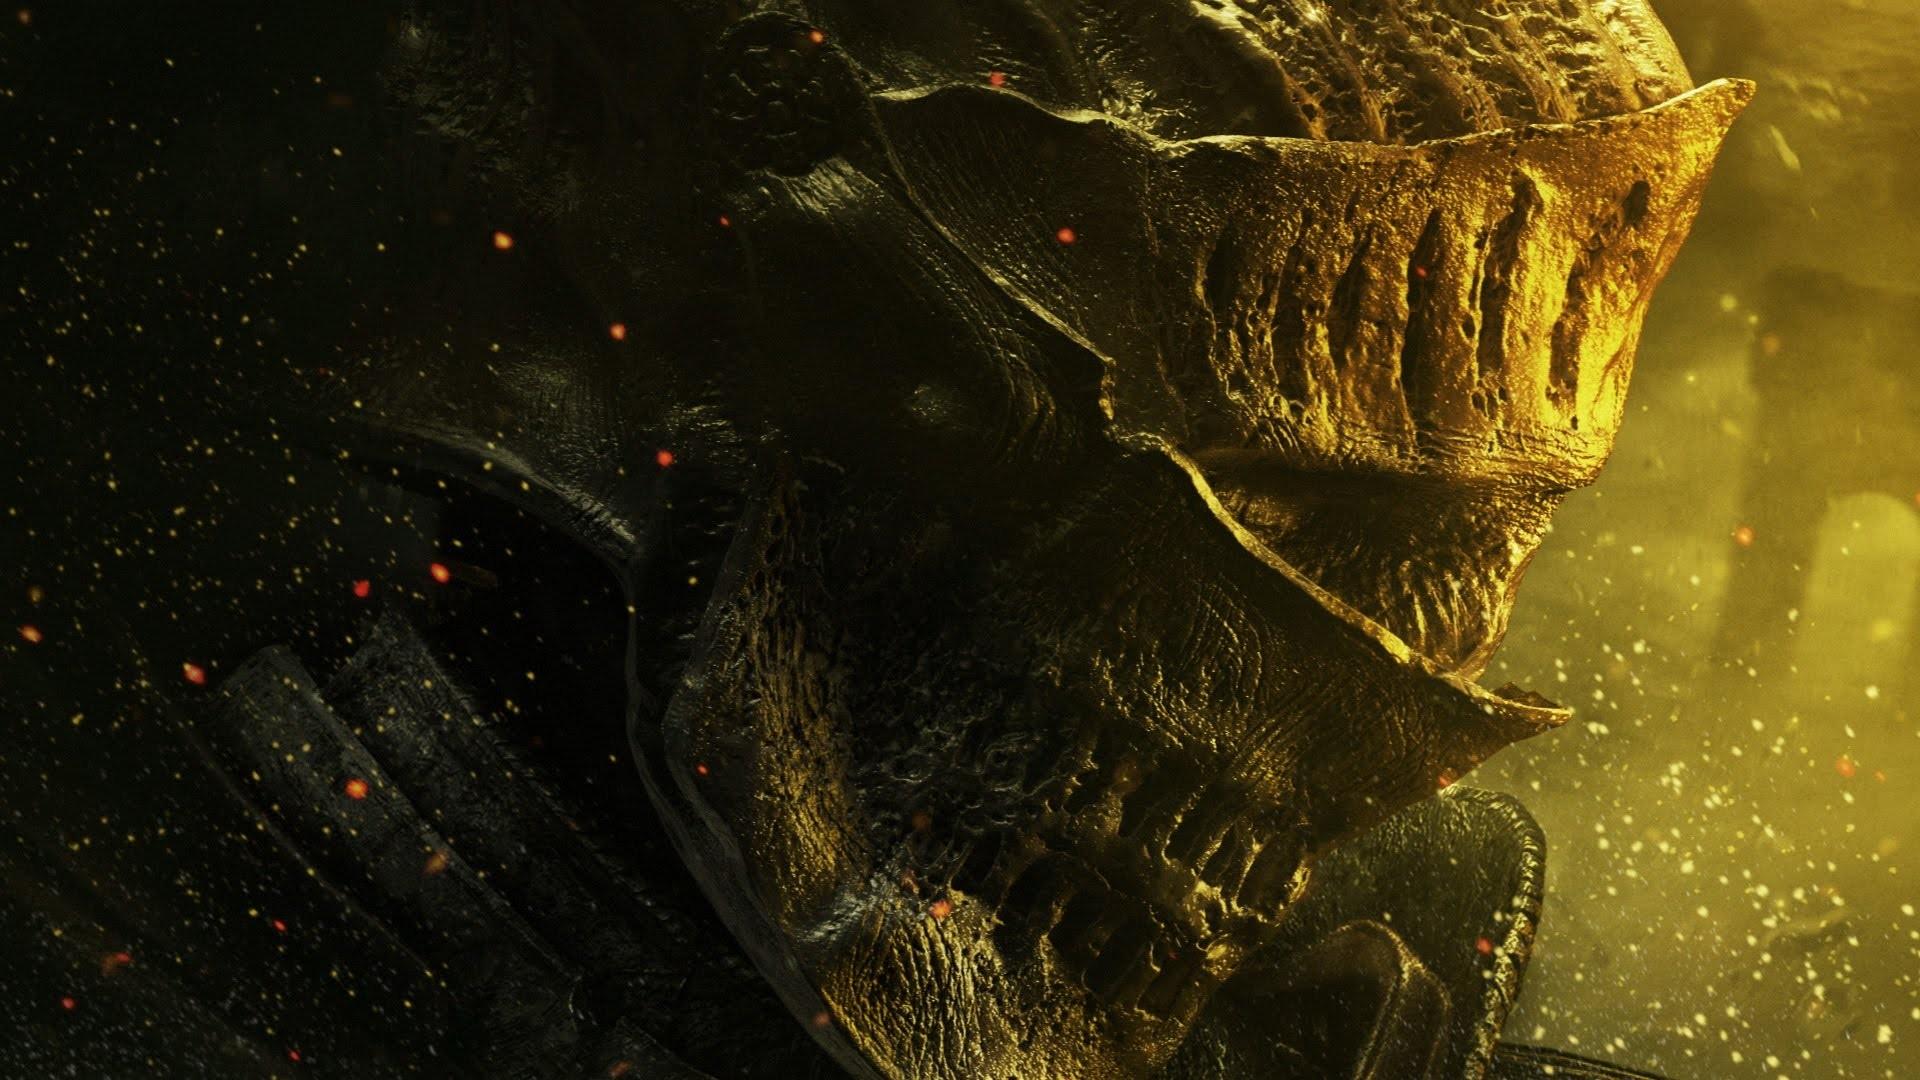 Dark Souls 3 wallpaper 1920x1080 ·① Download free awesome ...